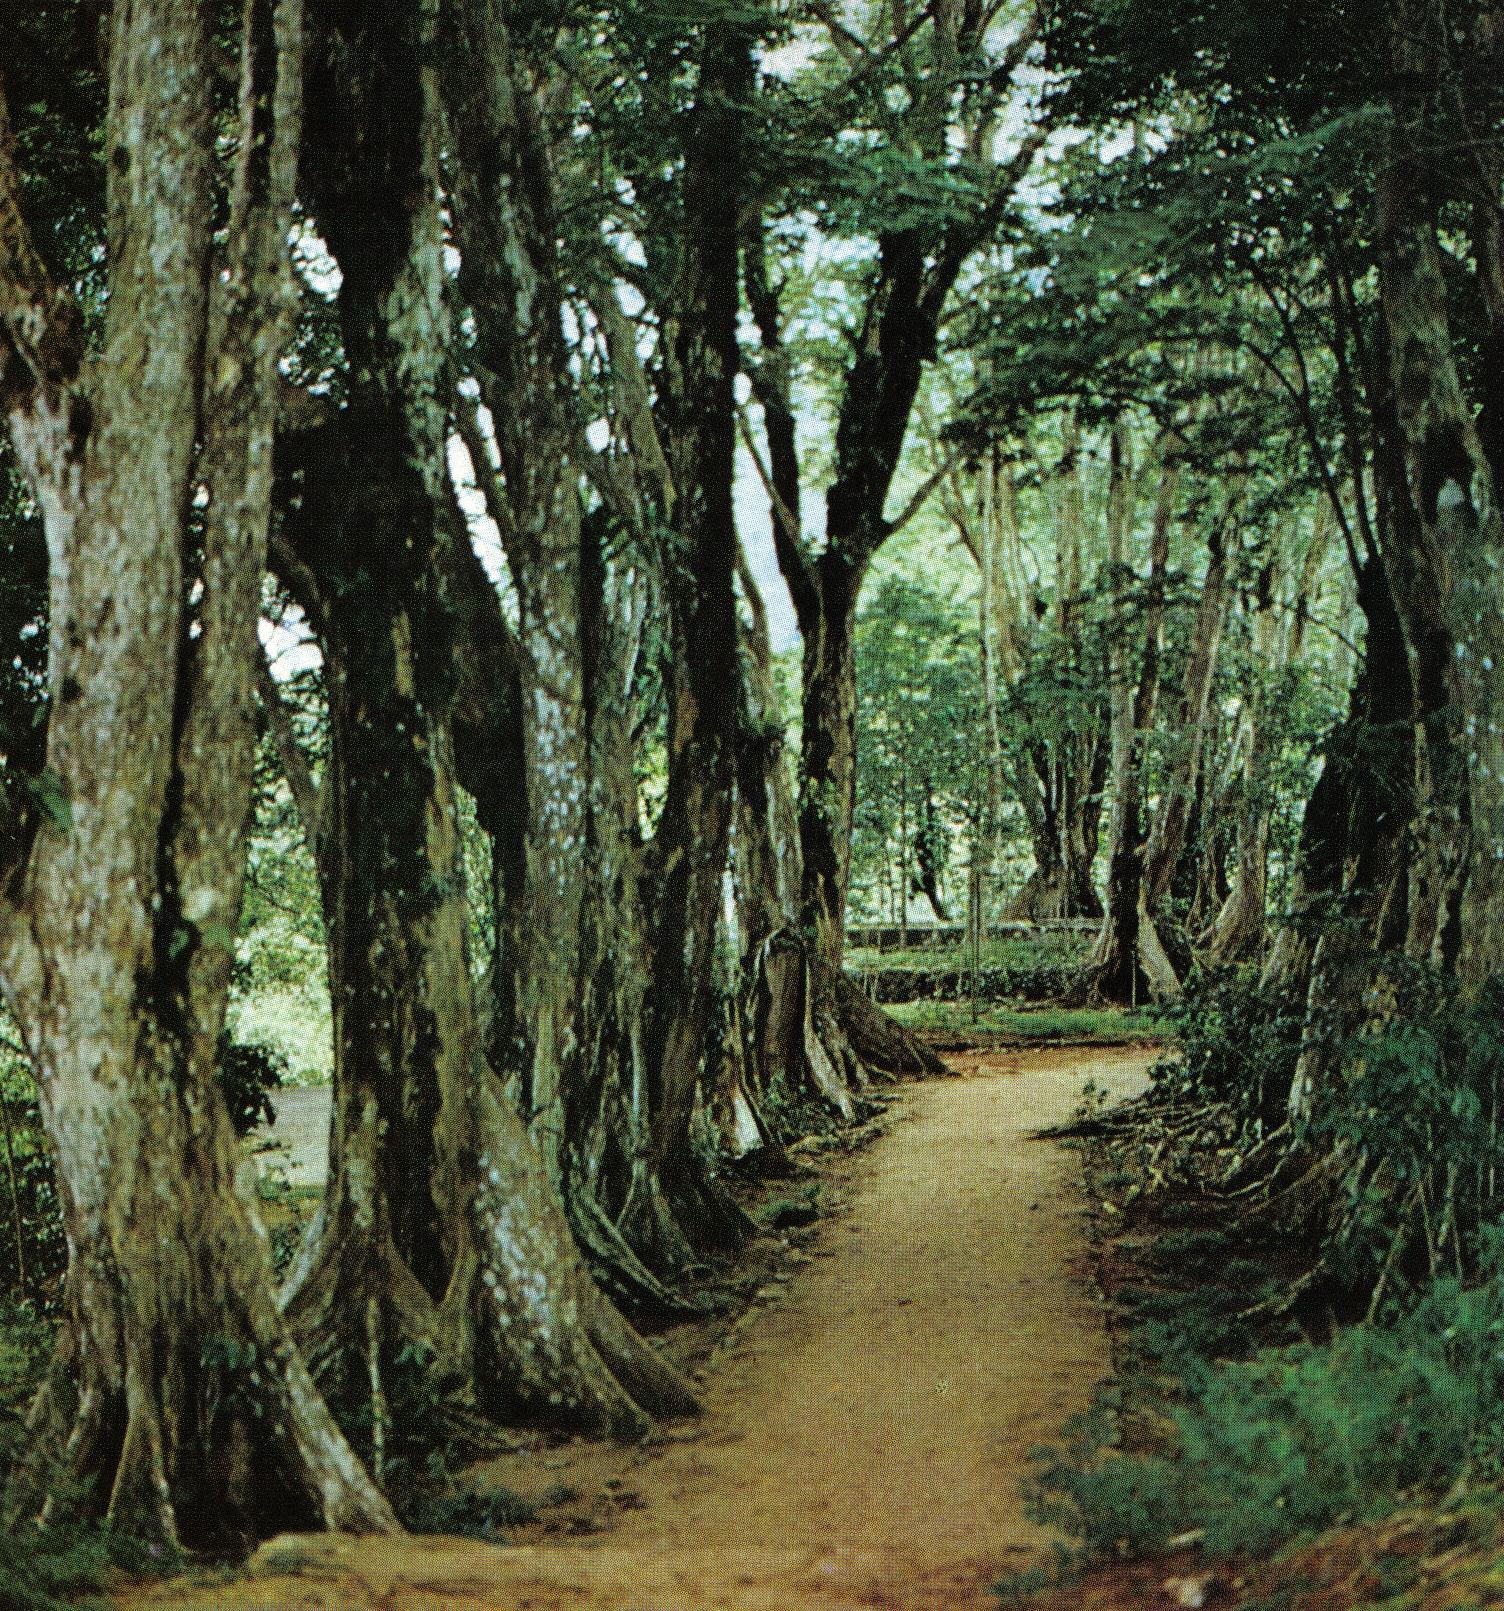 Footpath at the Morne Seychellois National Park, Seychelles